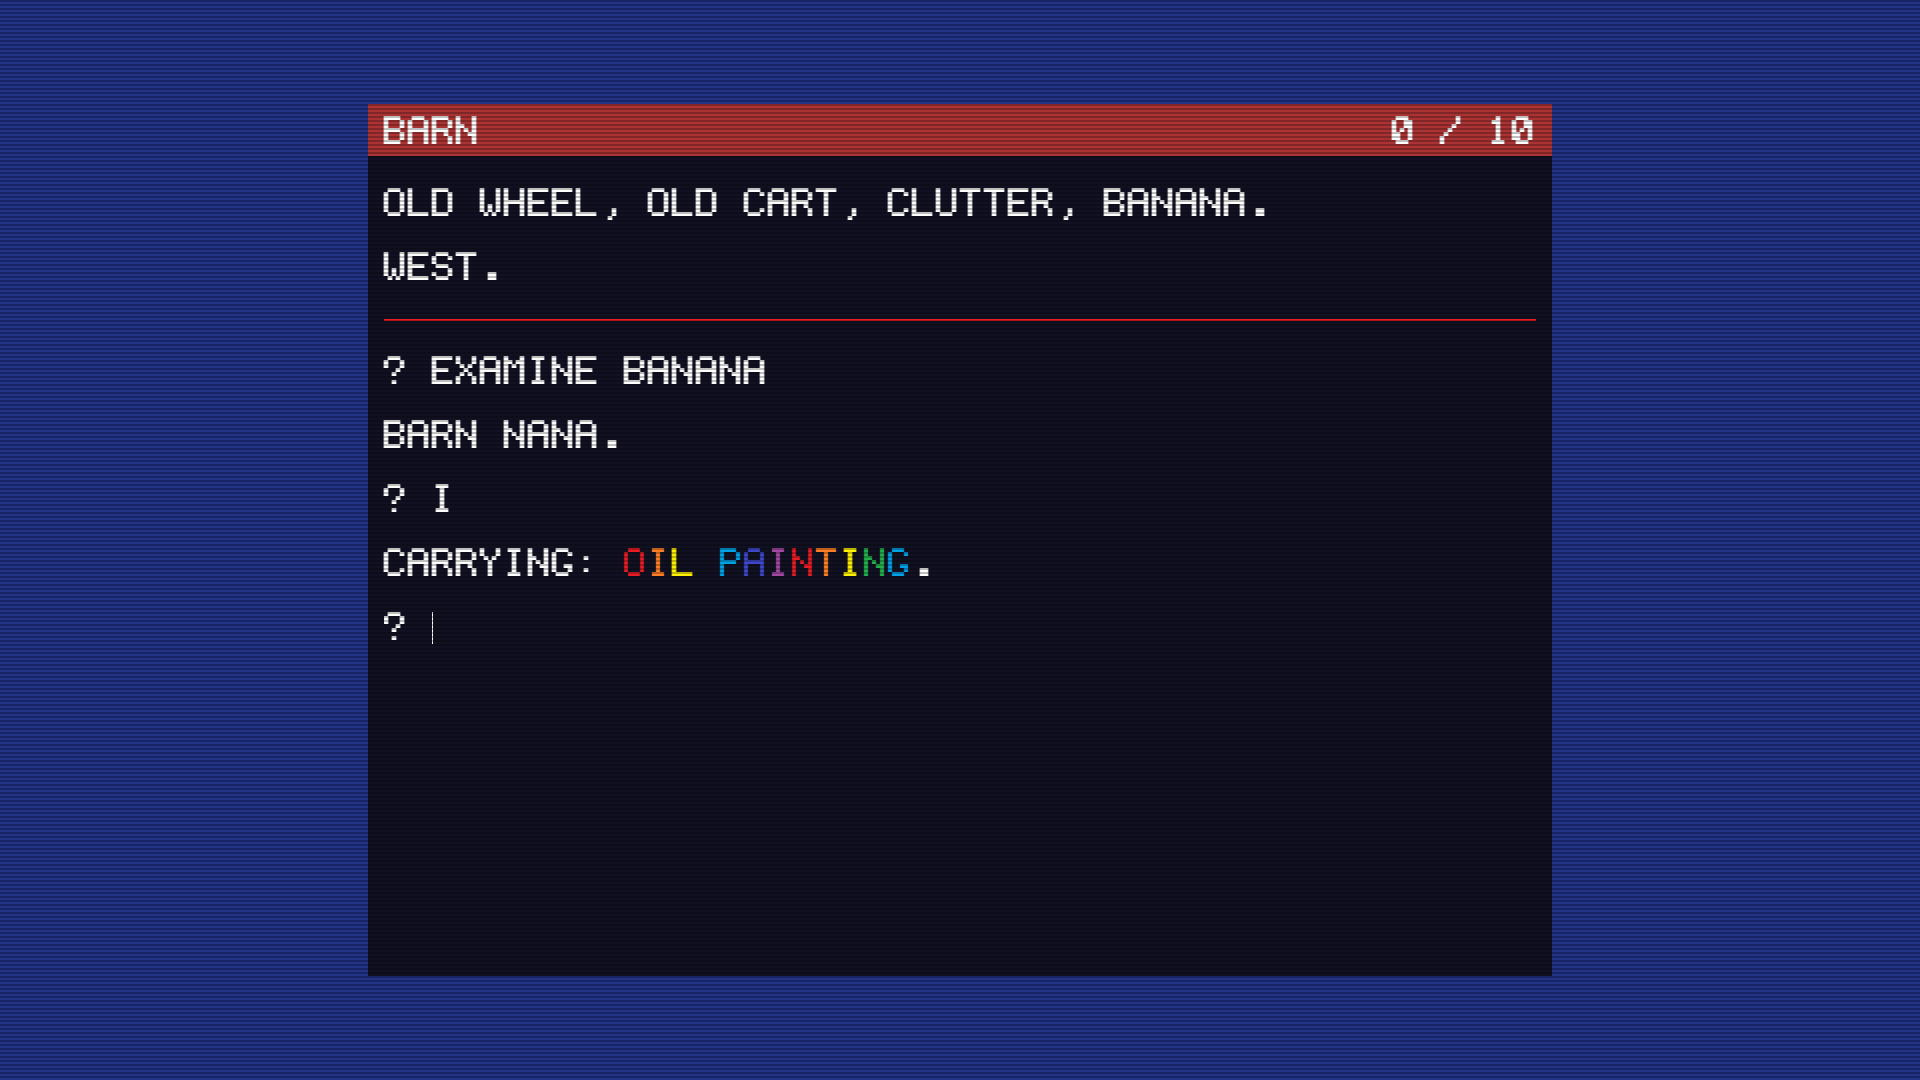 TWO, a treasure hunt game written using Adventuron